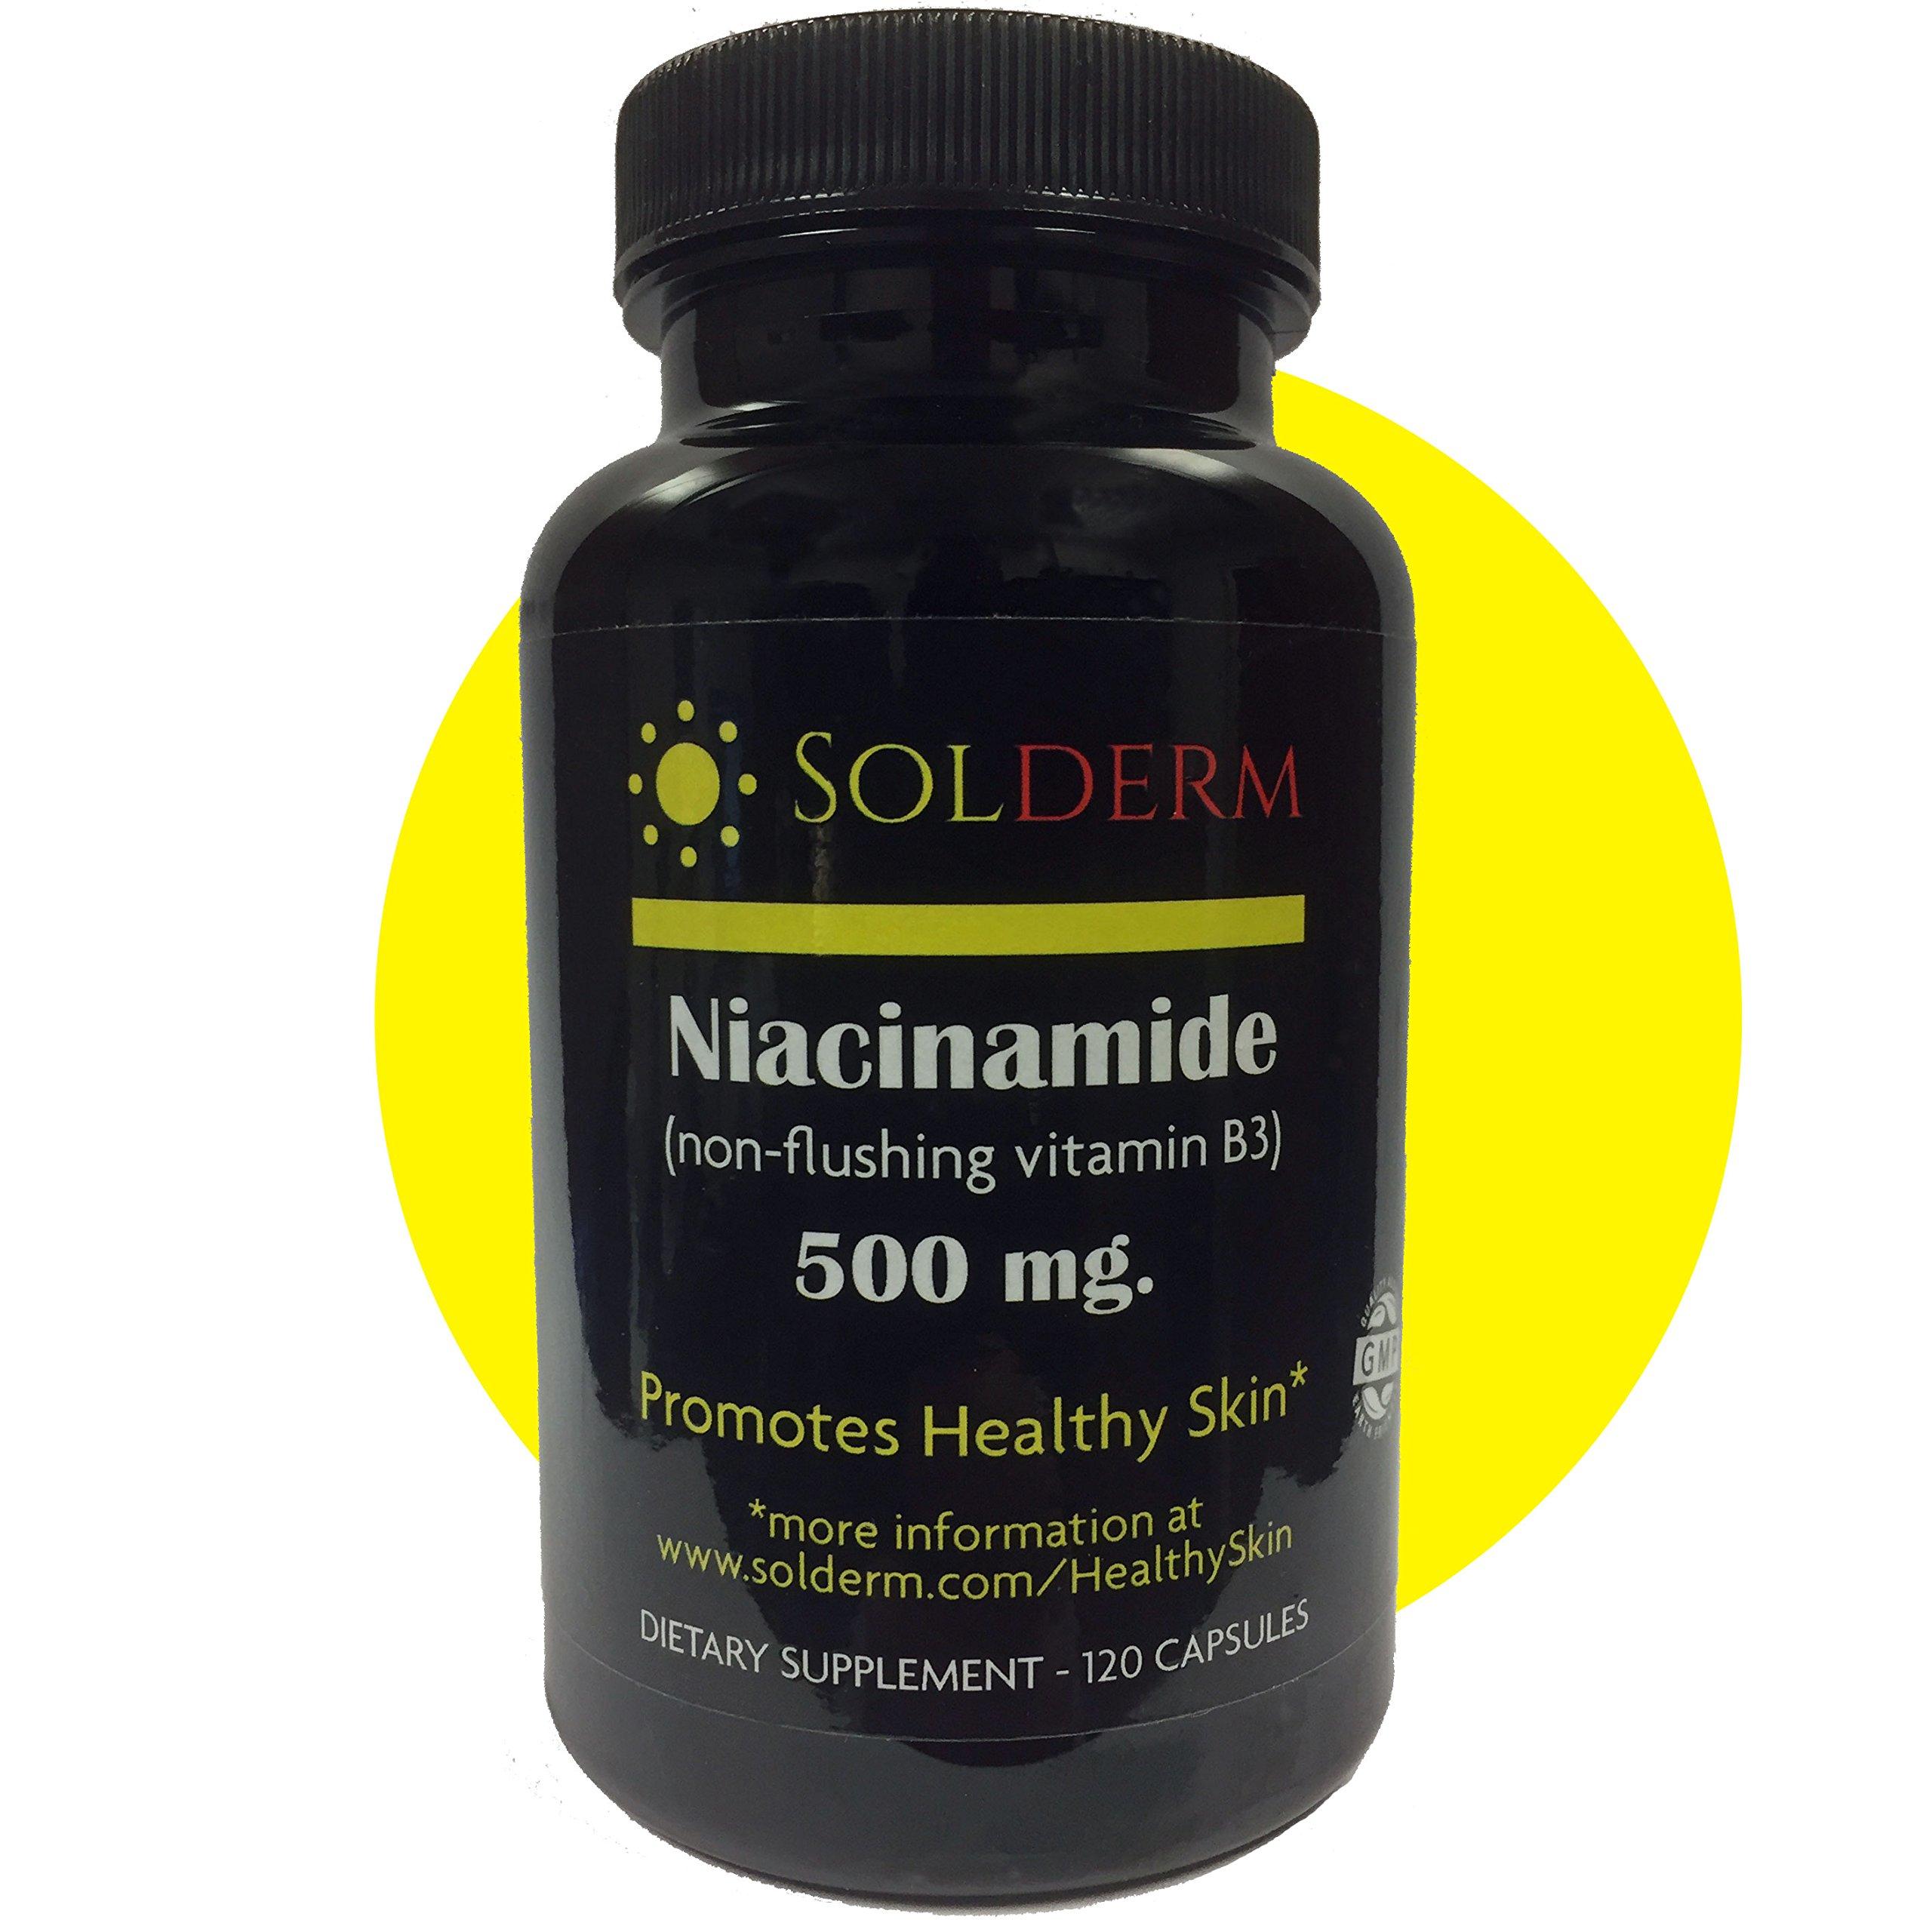 Solderm Niacinamide 500mg non-flushing vitamin B3 by Solderm